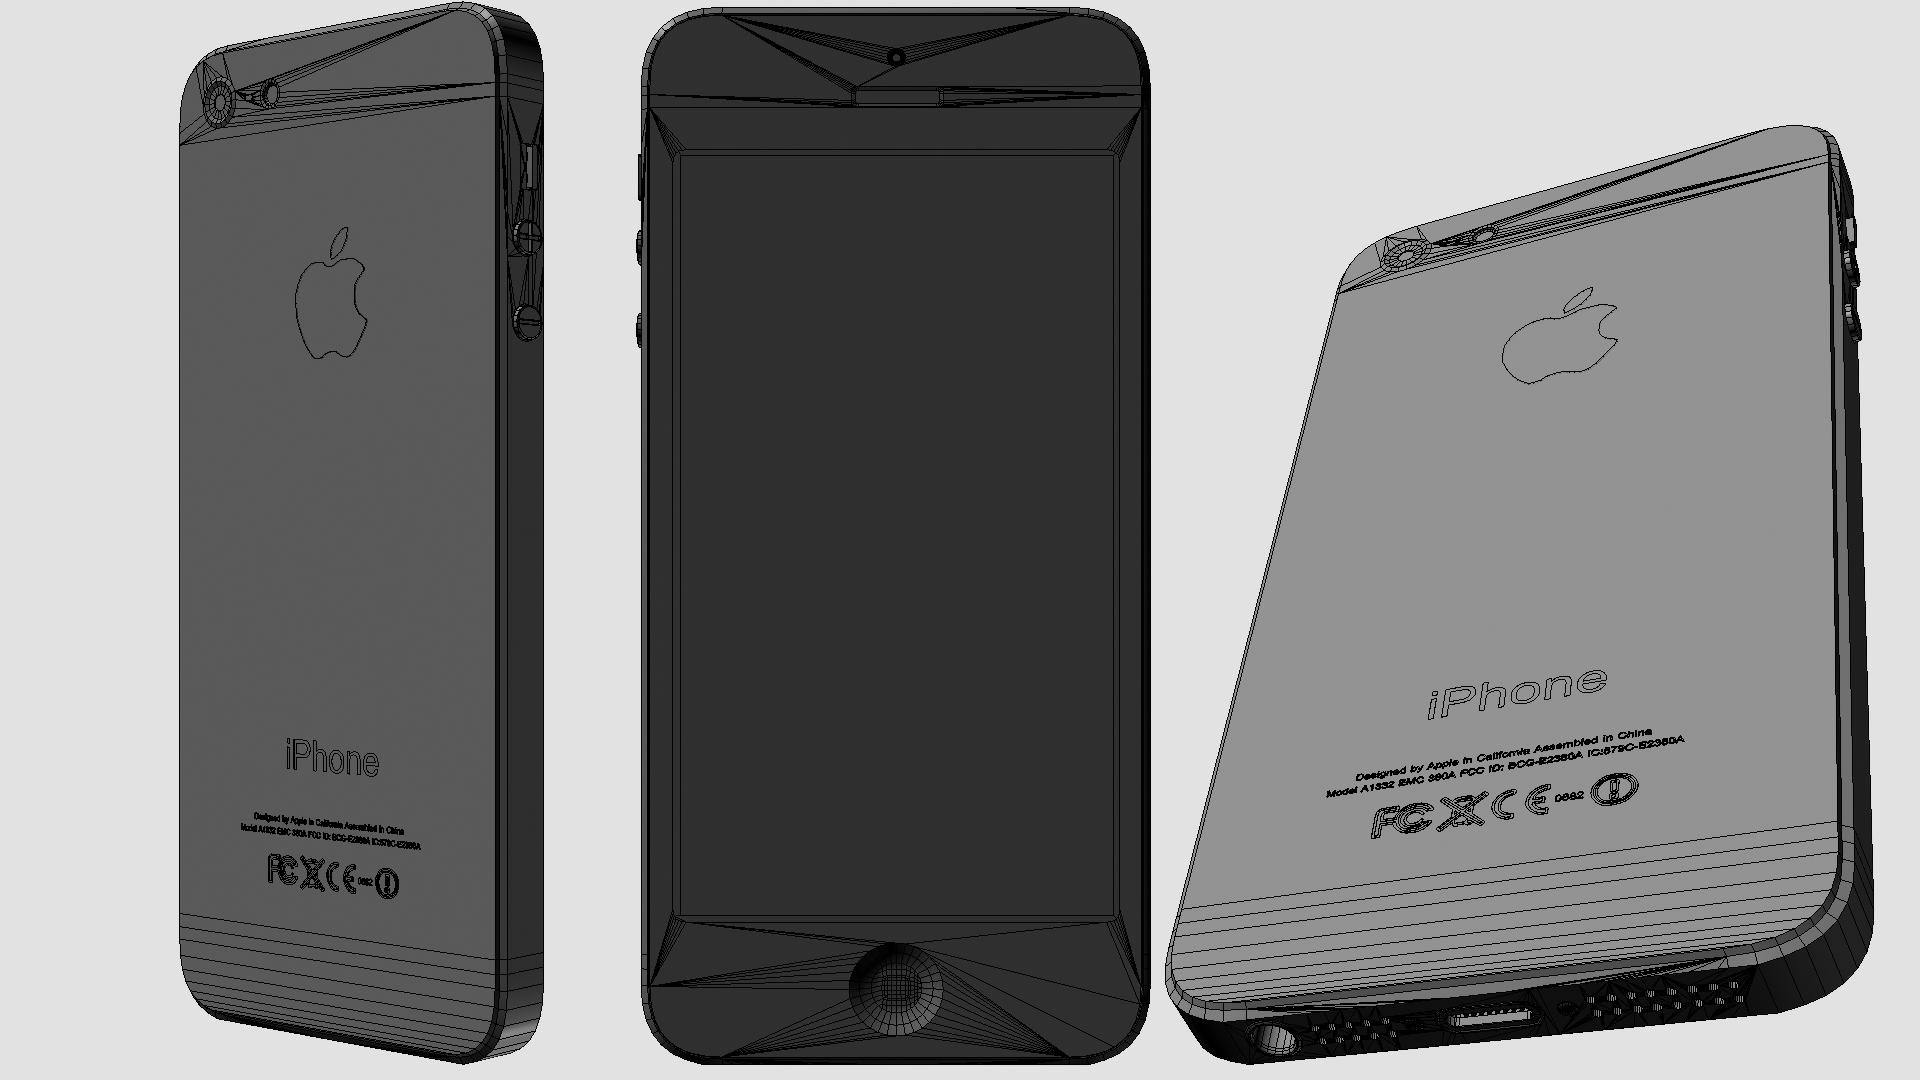 IPhone 5 Slate Black Vray